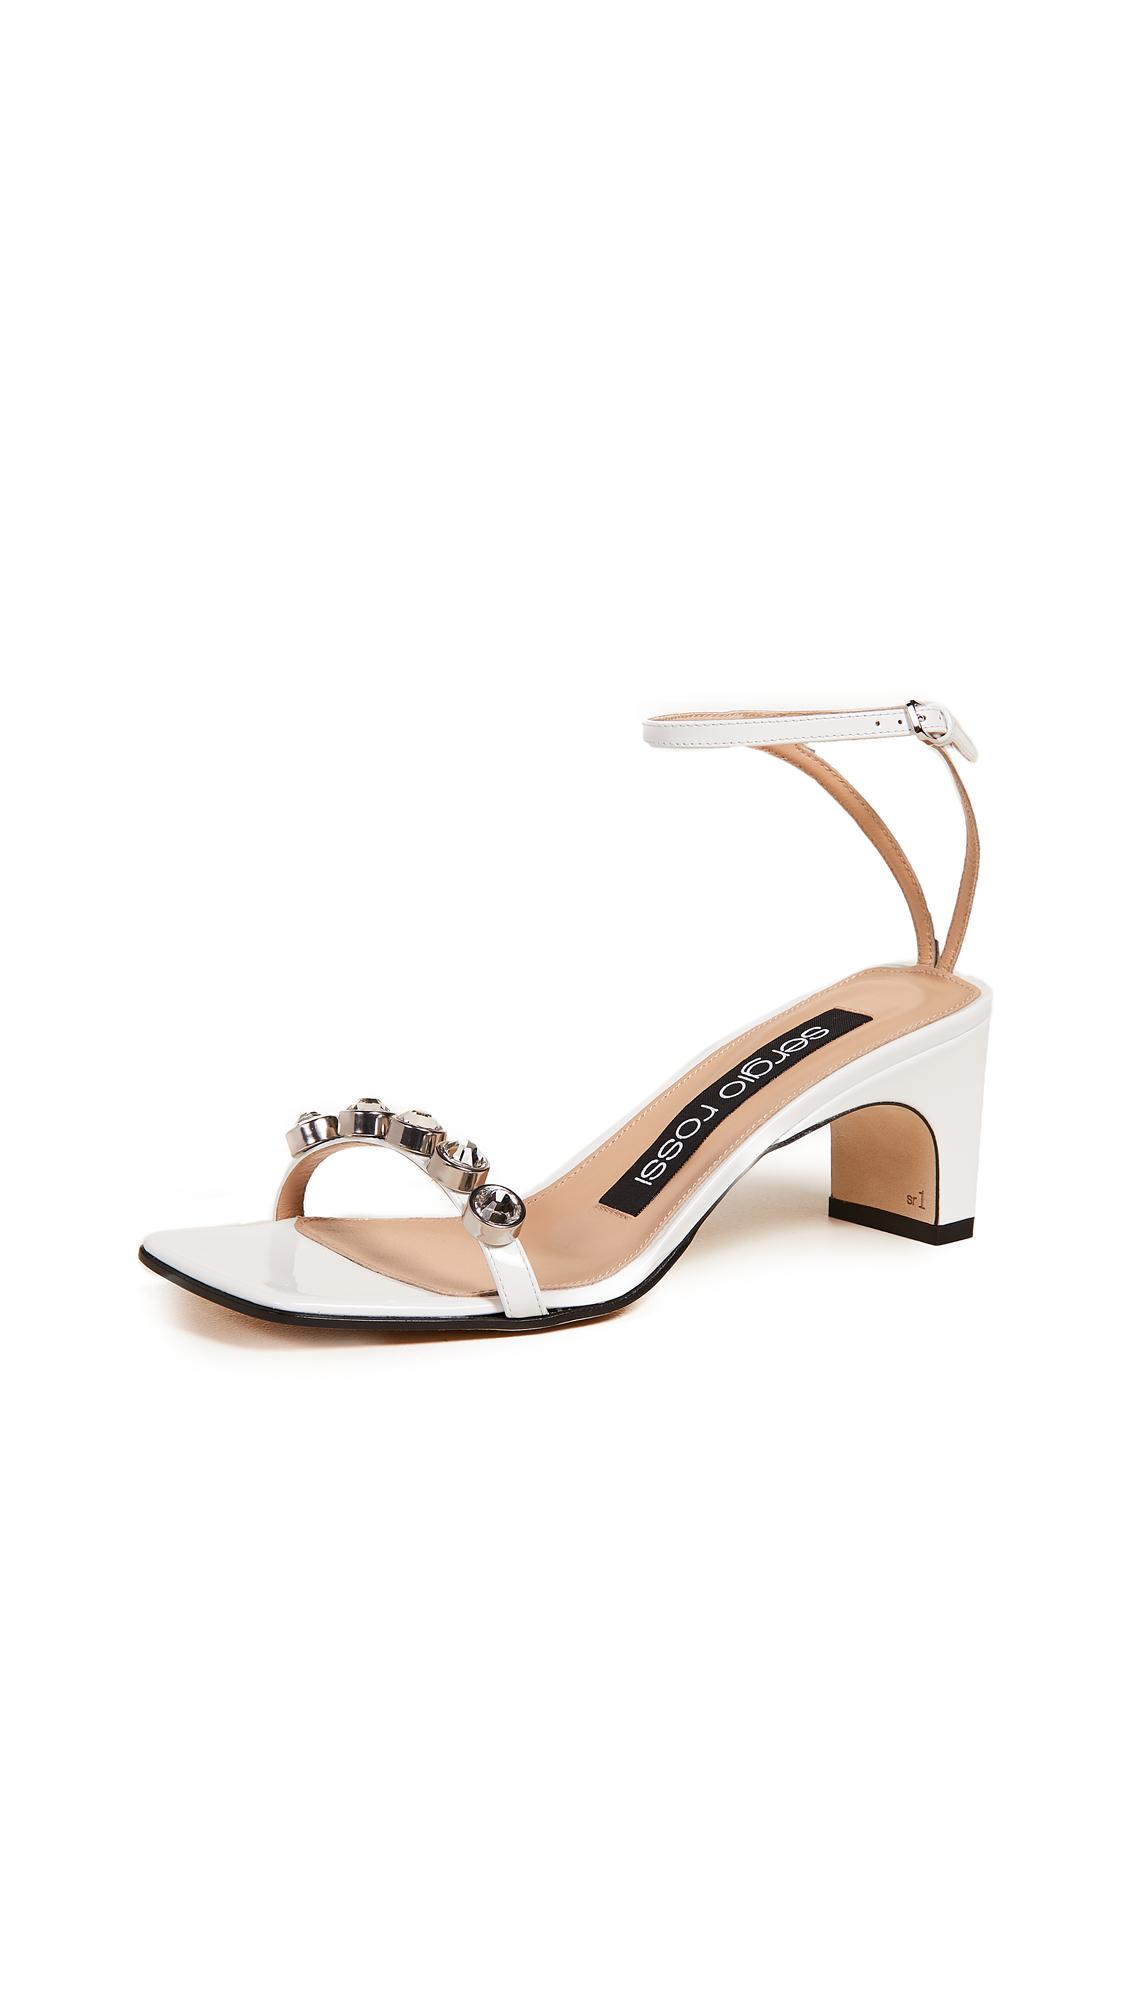 Sergio Rossi SR1 Sandals - Bianco